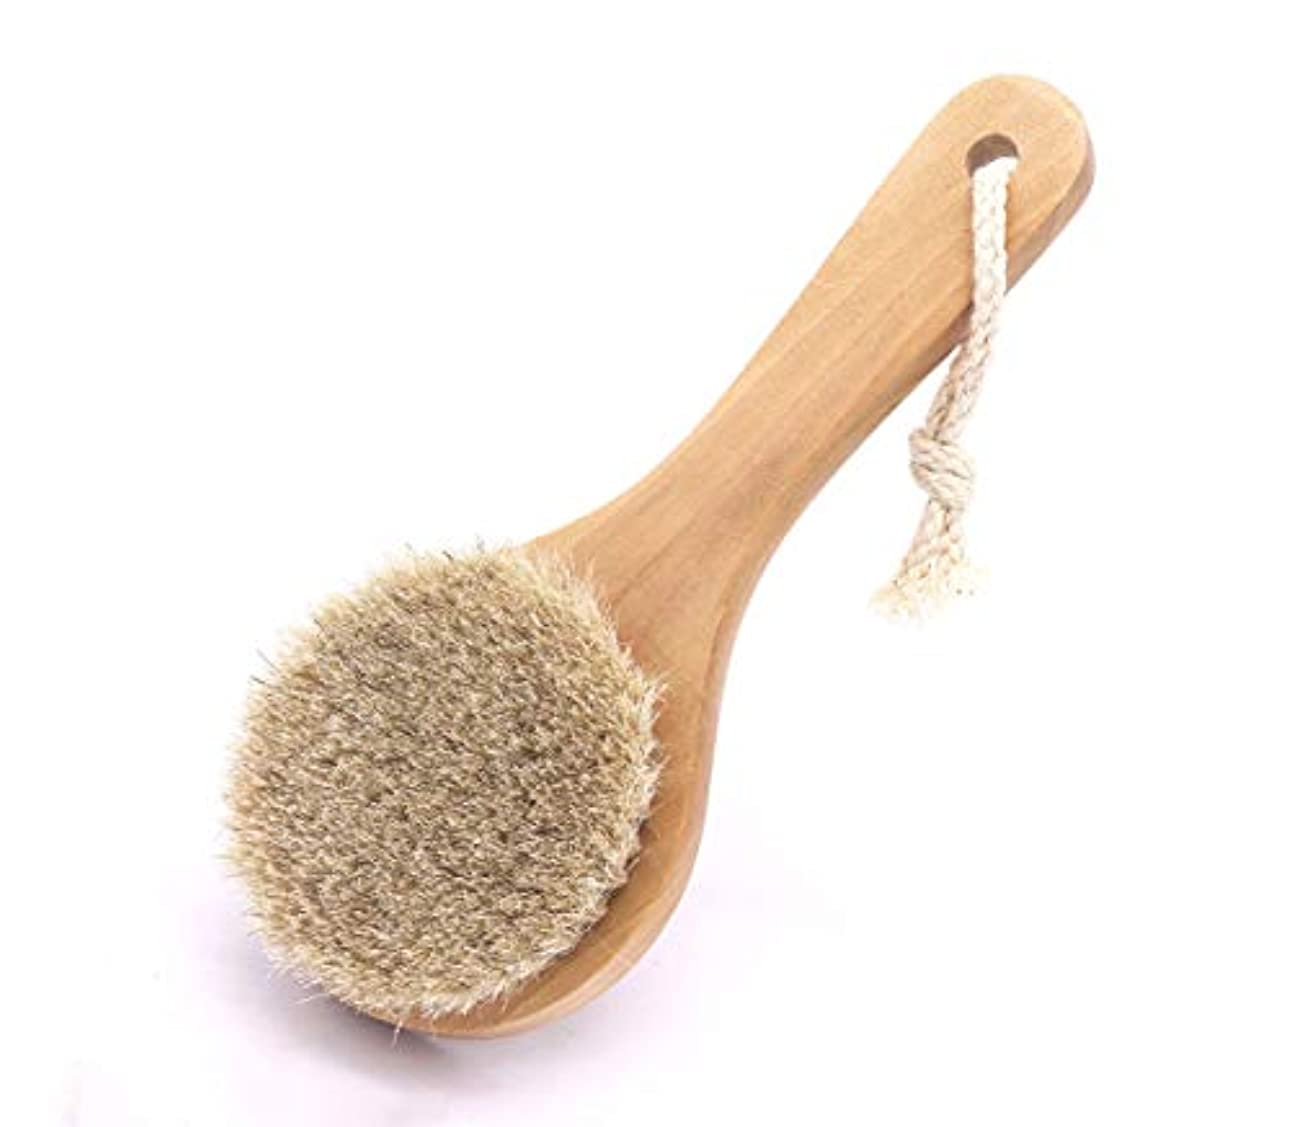 Maltose 馬毛ボディブラシ 短柄 ボディぶらし 馬毛 ボディ 洗う 洗身体ブラシ お風呂用 女性 男性 角質 美肌